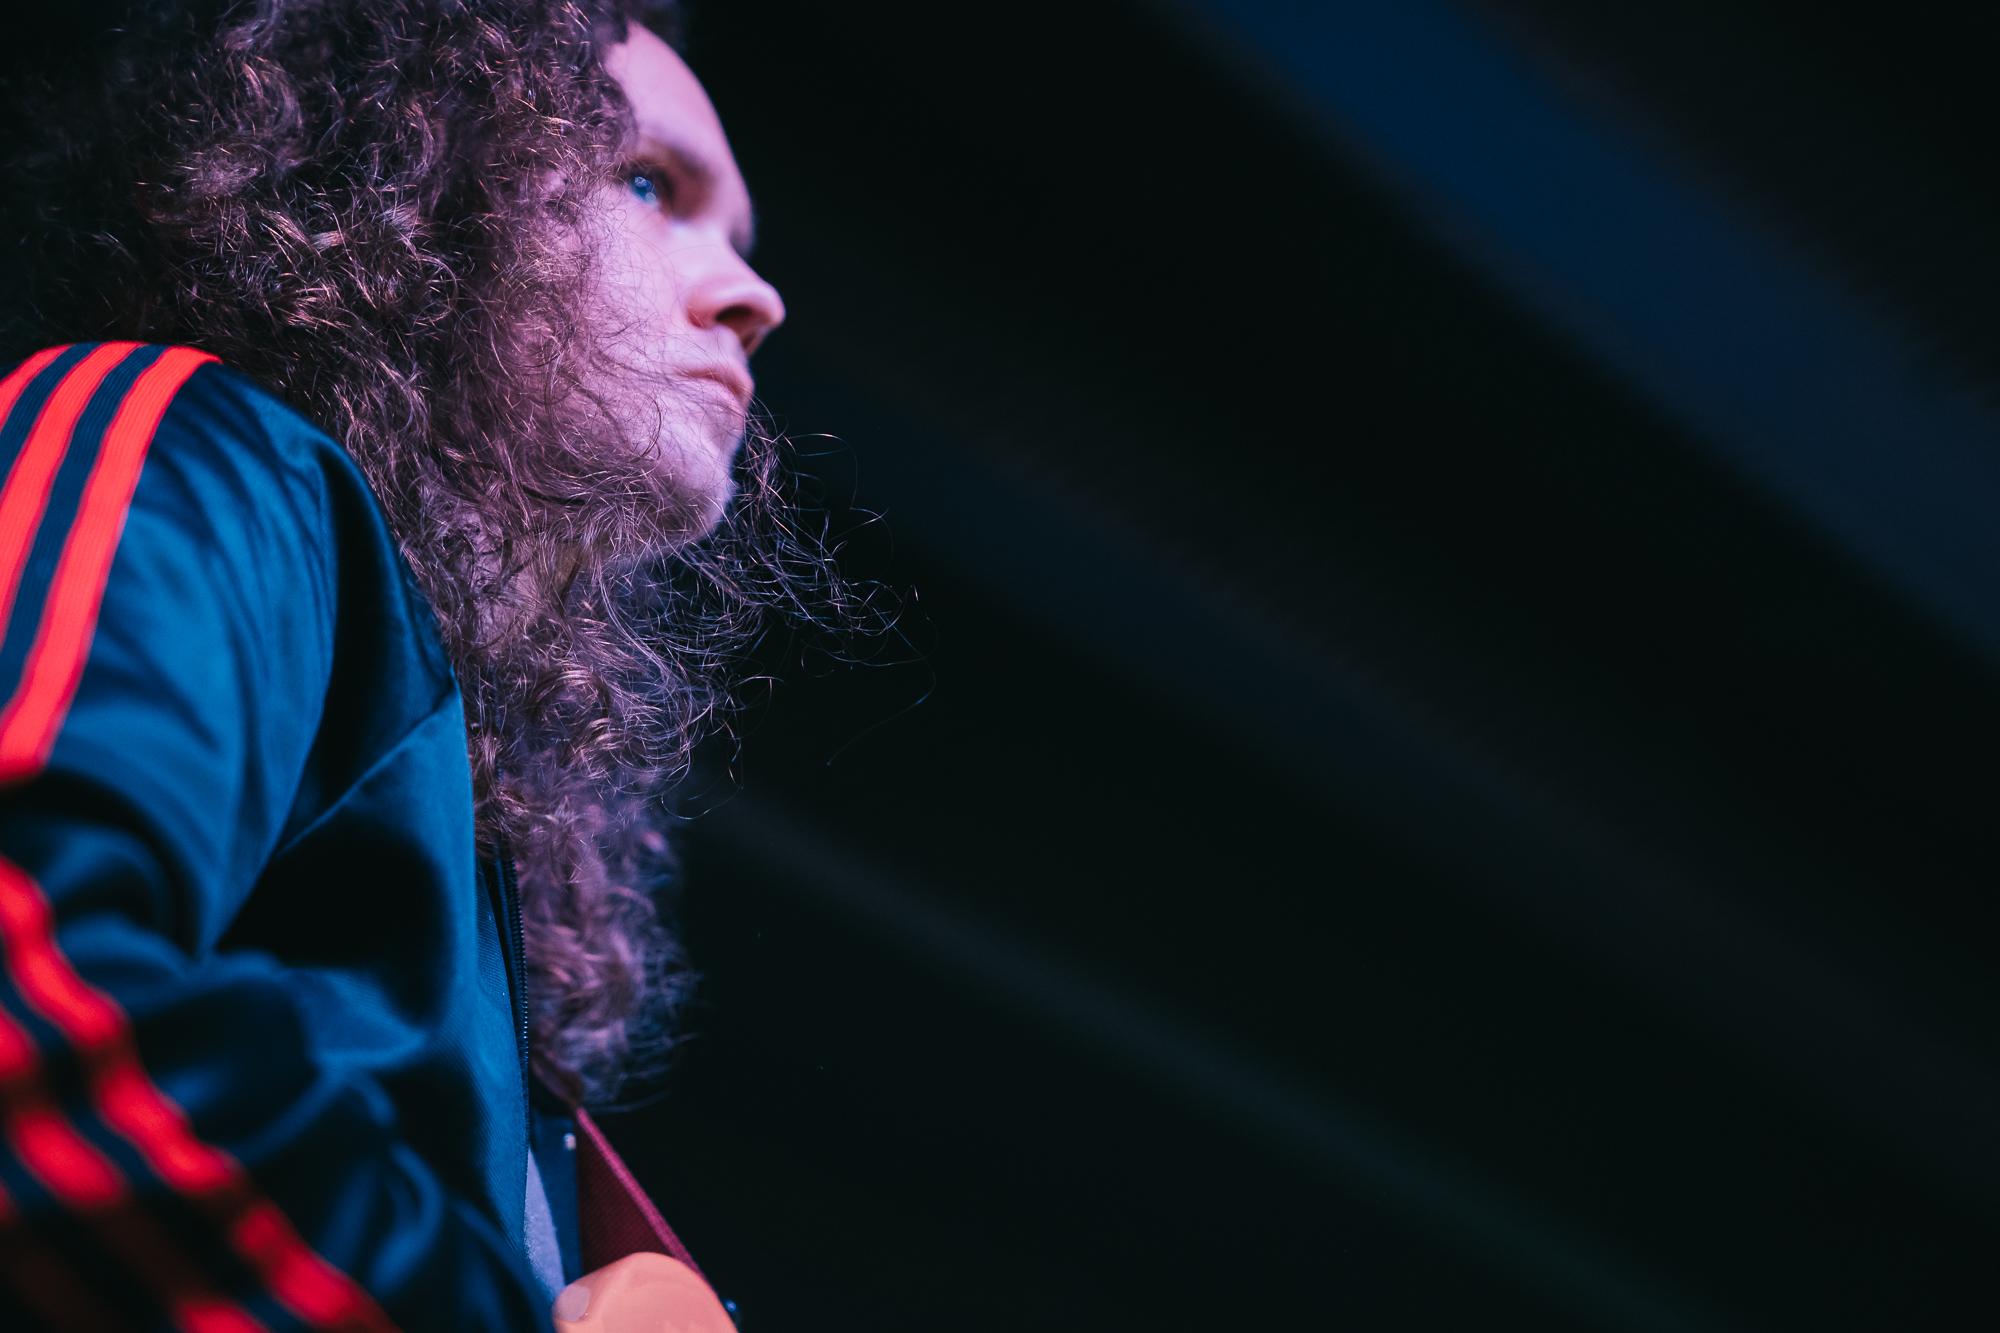 Bridges-band-live-session-20170101-0133-Hanny-Foxhall.jpg